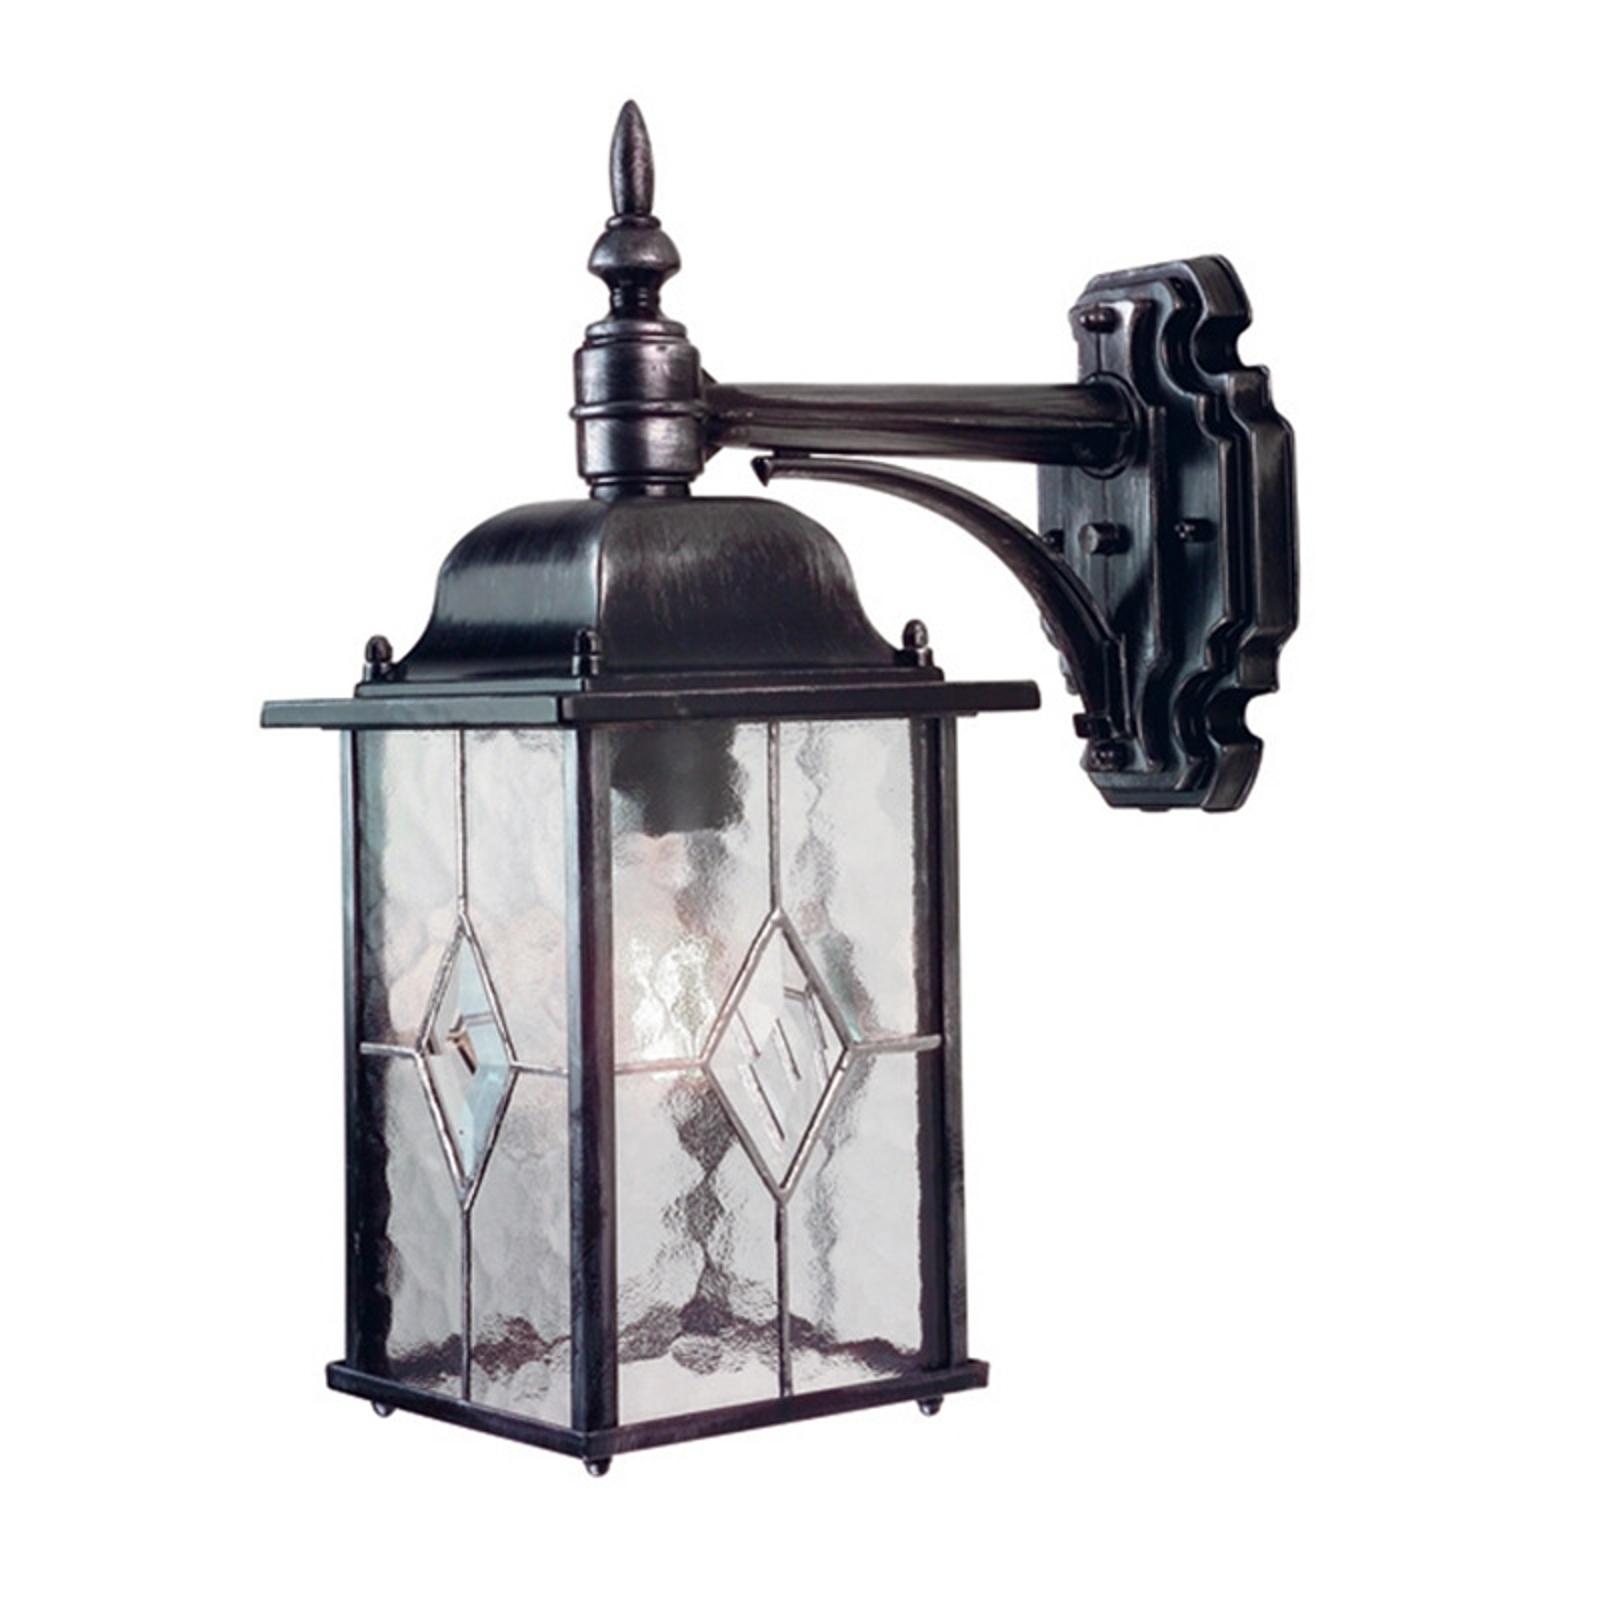 Wexford Outside Wall Light Lantern Shape_3048210_1